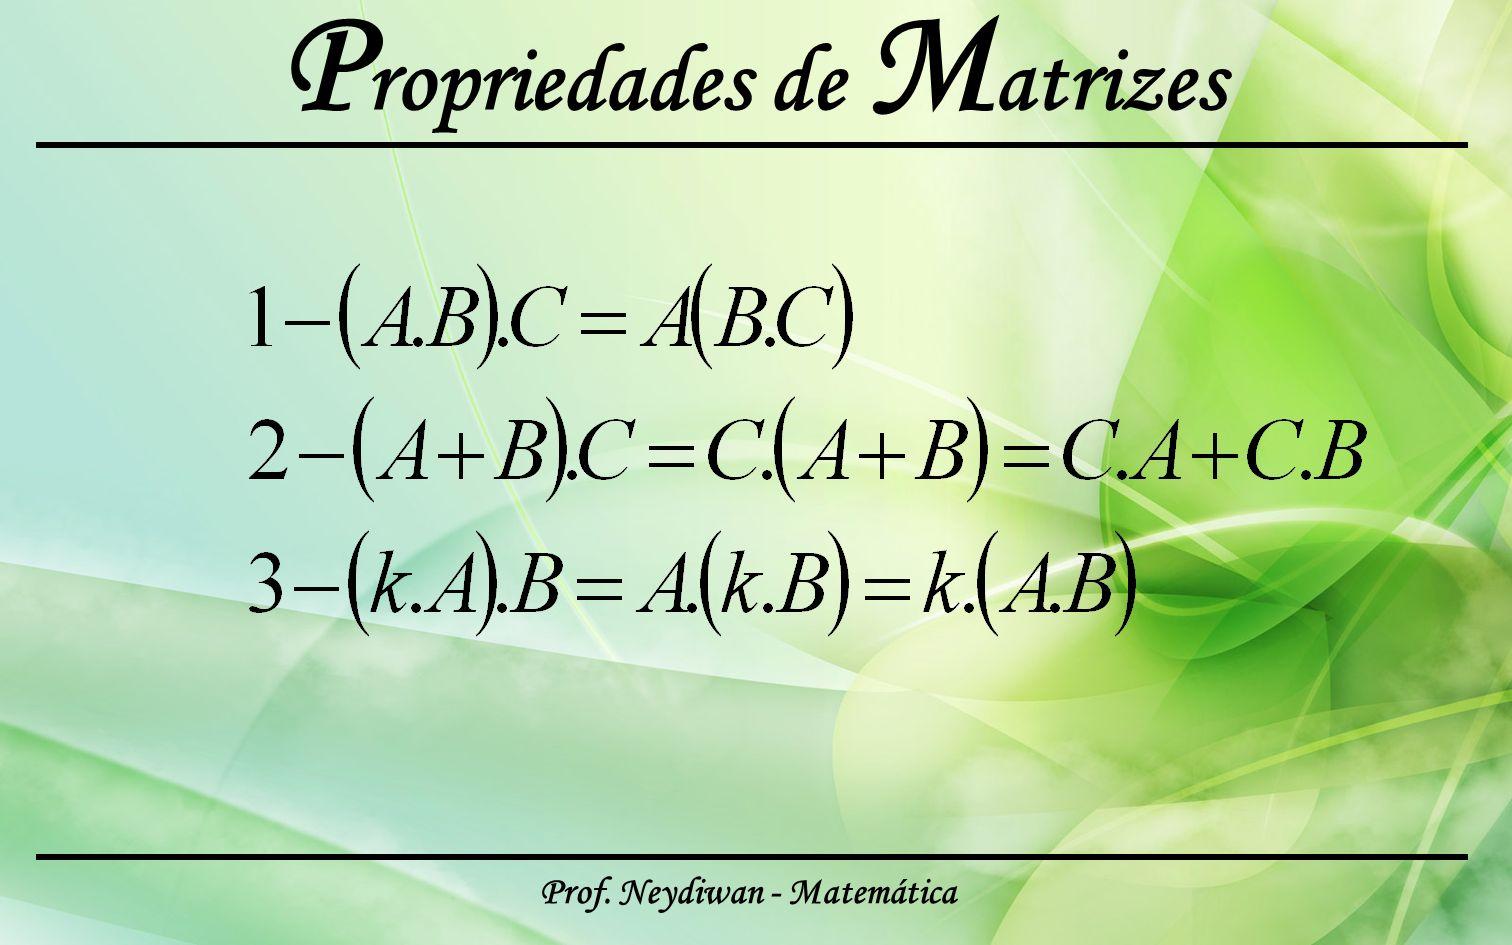 Prof. Neydiwan - Matemática P ropriedades de M atrizes